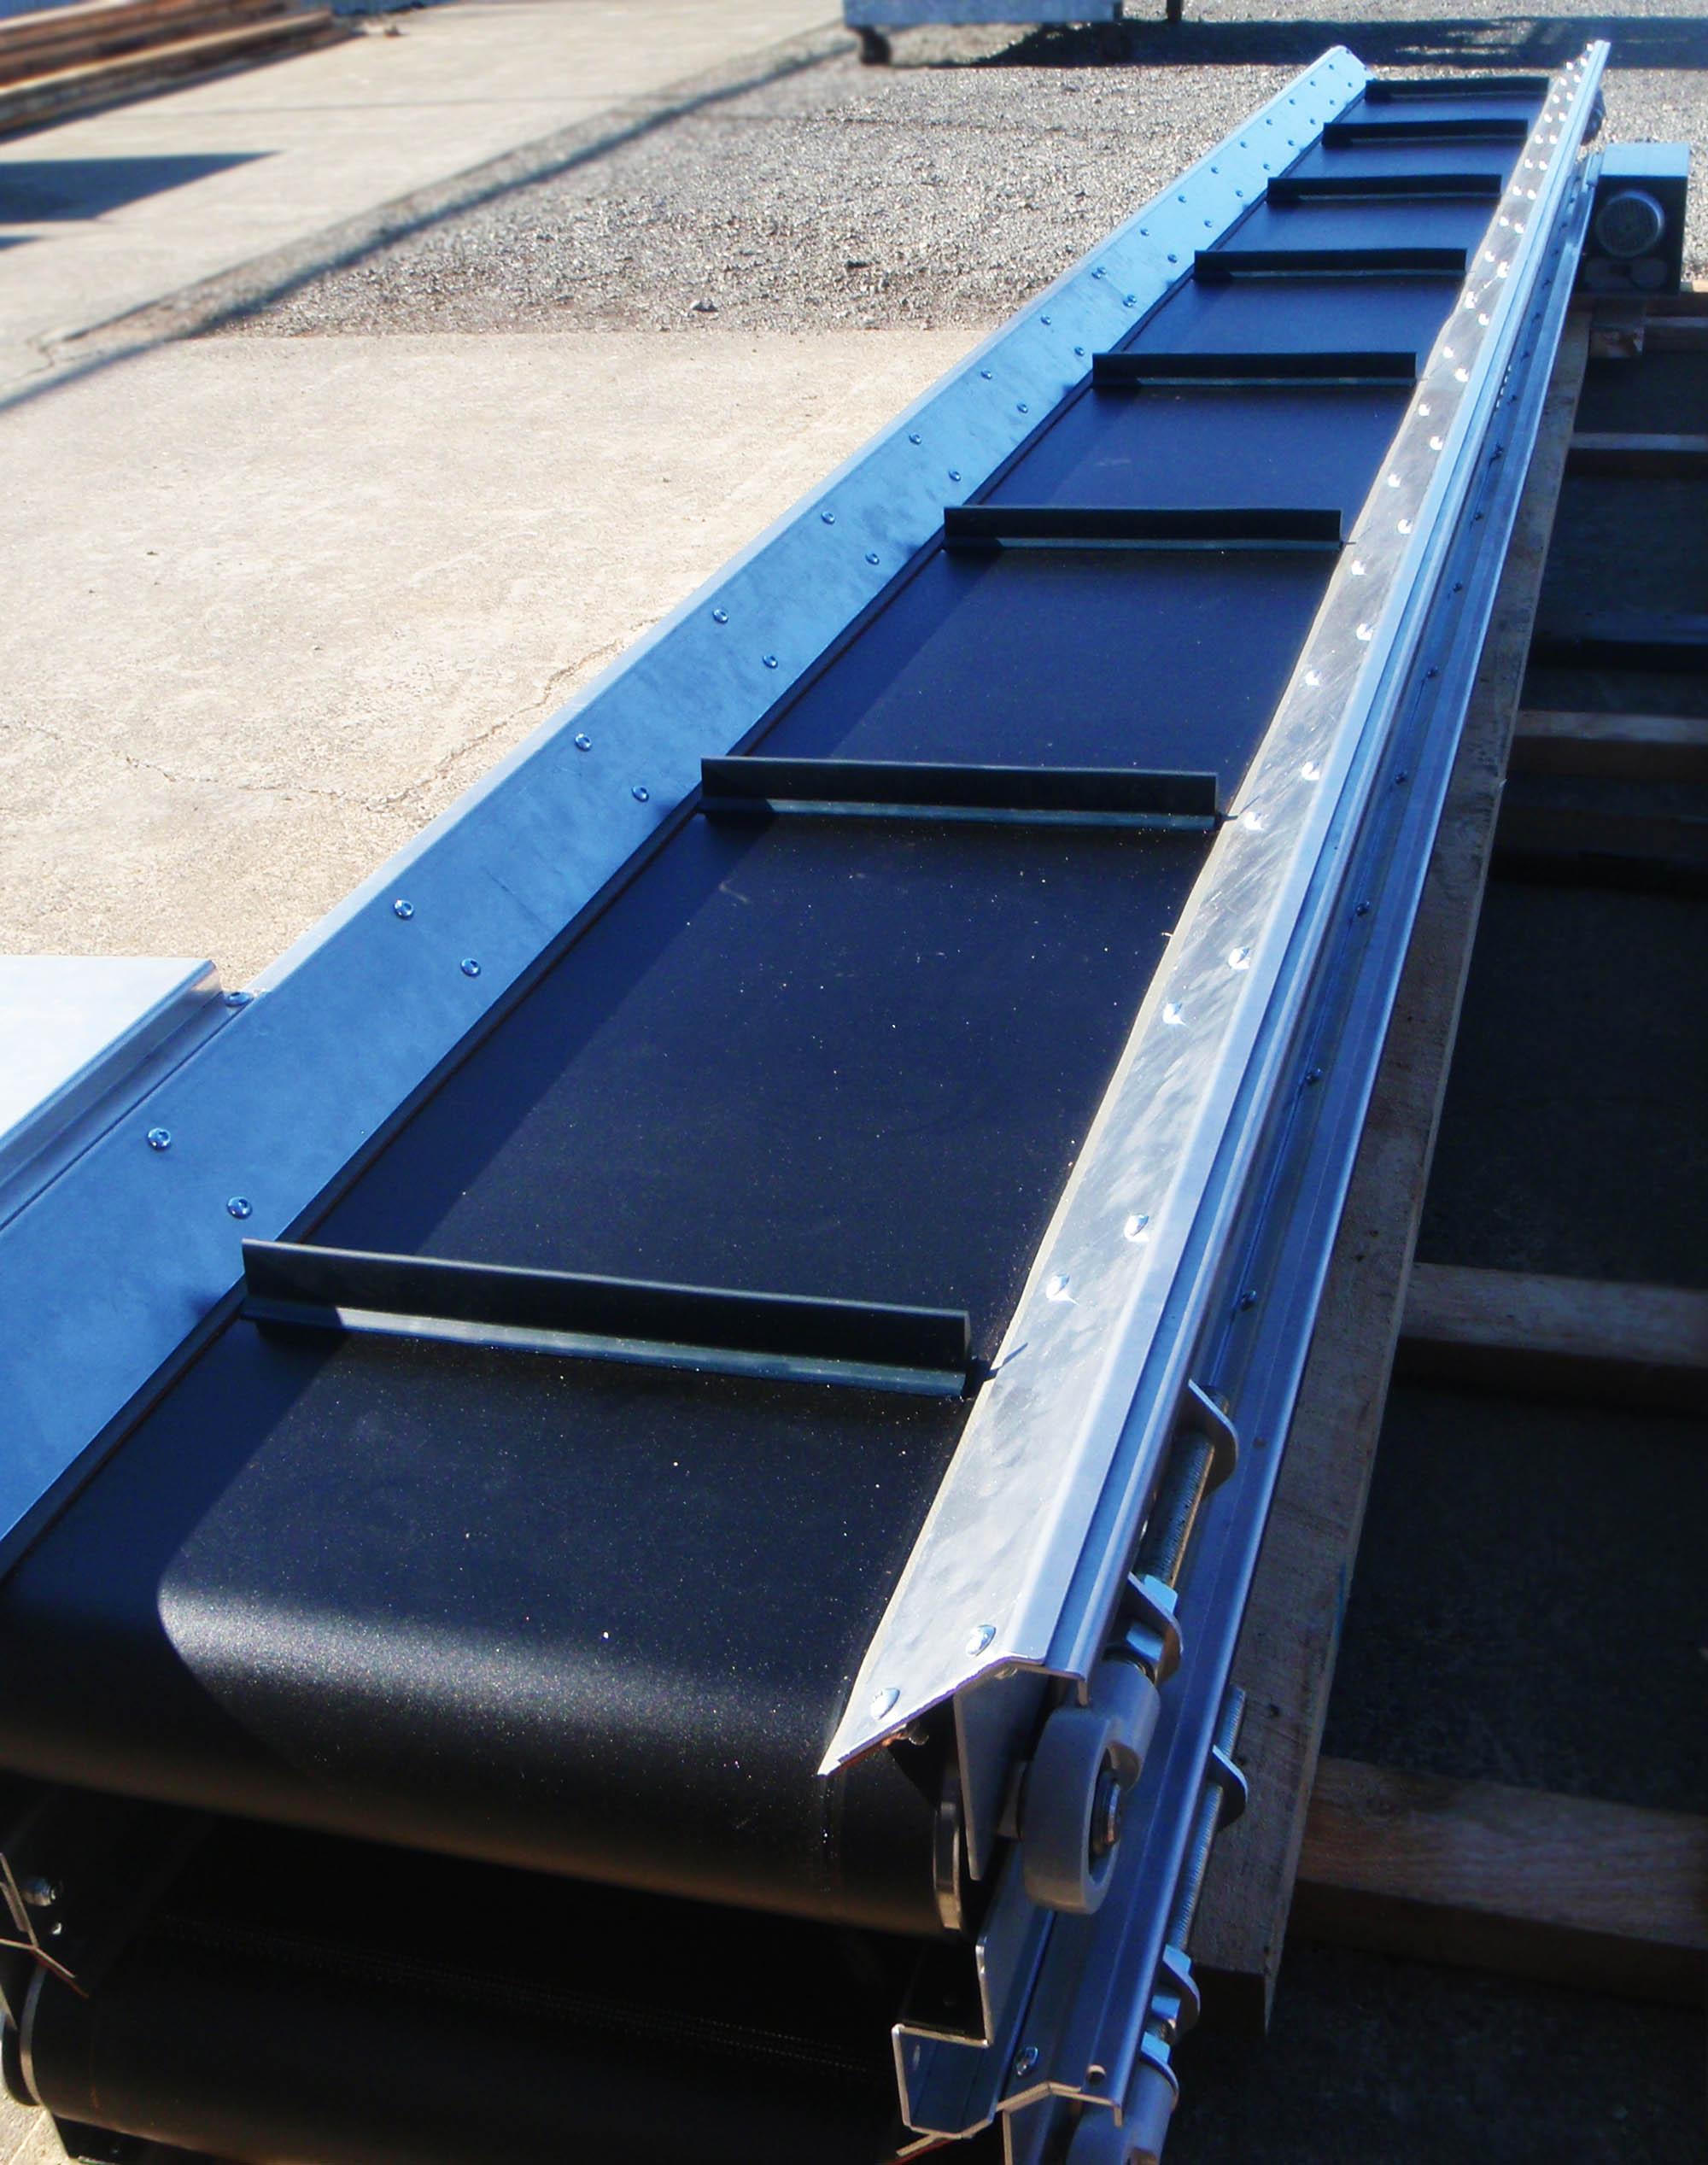 Tranzbelt TR - Trough Belt Conveyor   Dyno Conveyors NZ - Roller